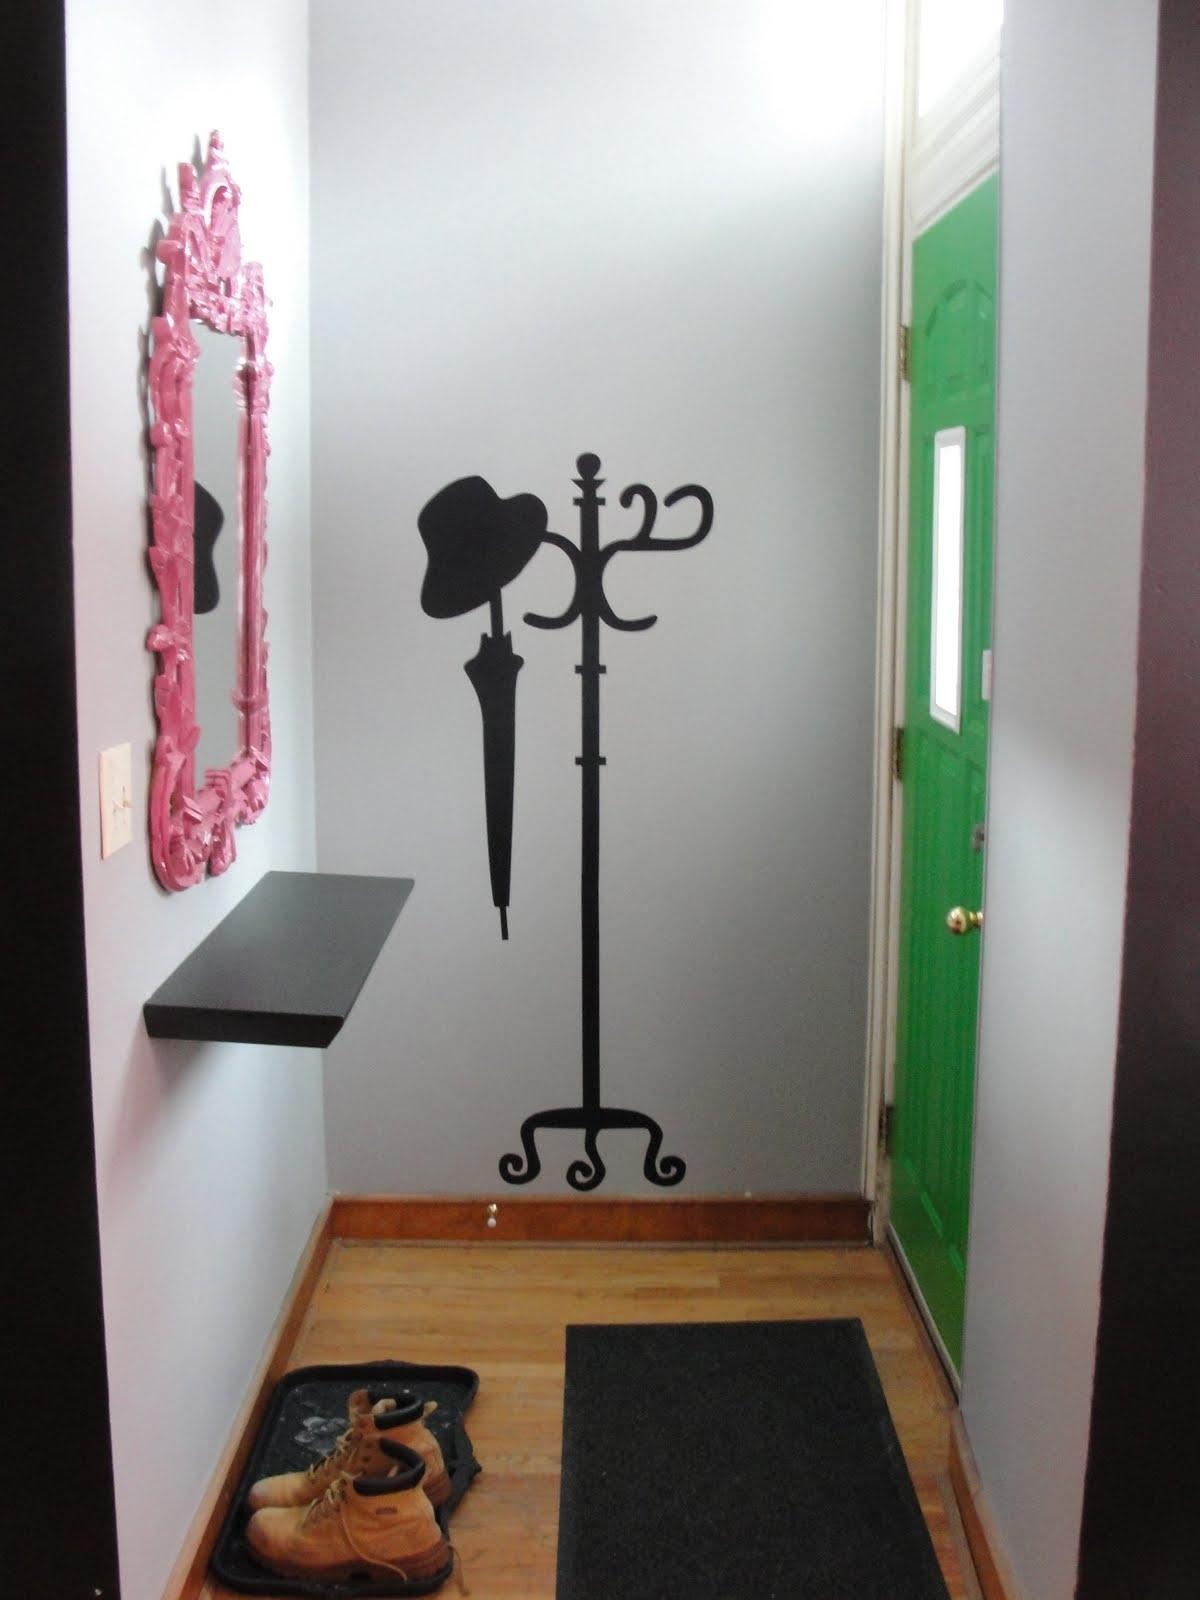 2017 Blik Wall Art Inside Apartment 528: Blik Your Walls (View 4 of 15)